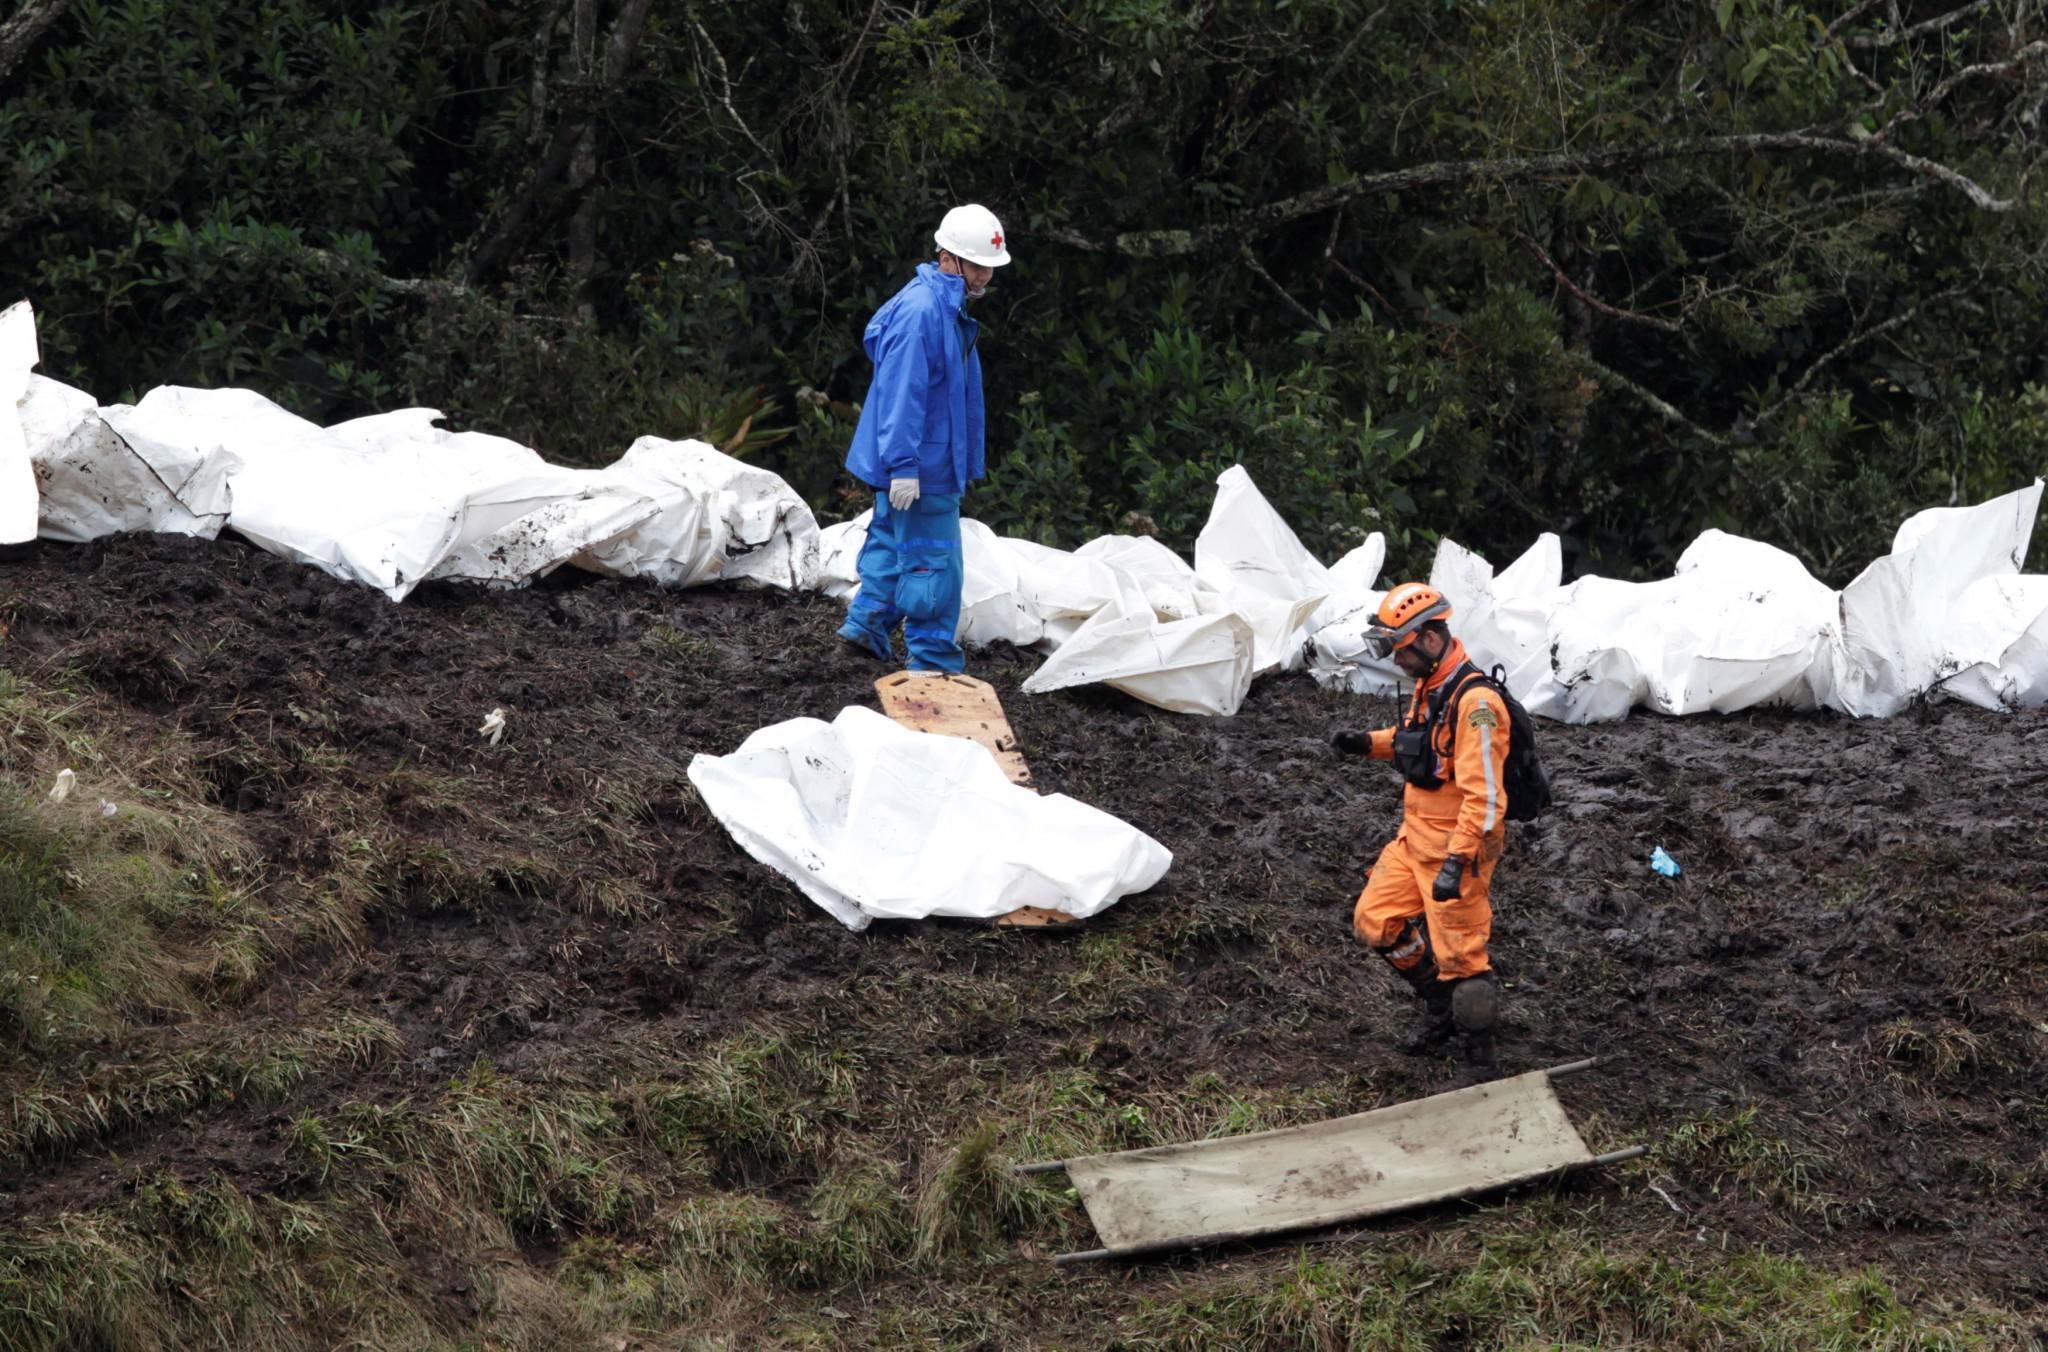 tragodia-aeroporiko-dustixima-kolomvia-nekroi-1300-3 71 είναι οι νεκροί από την αεροπορική τραγωδία στην Κολομβία- 4 δεν επιβιβάστηκαν στο αεροπλάνο